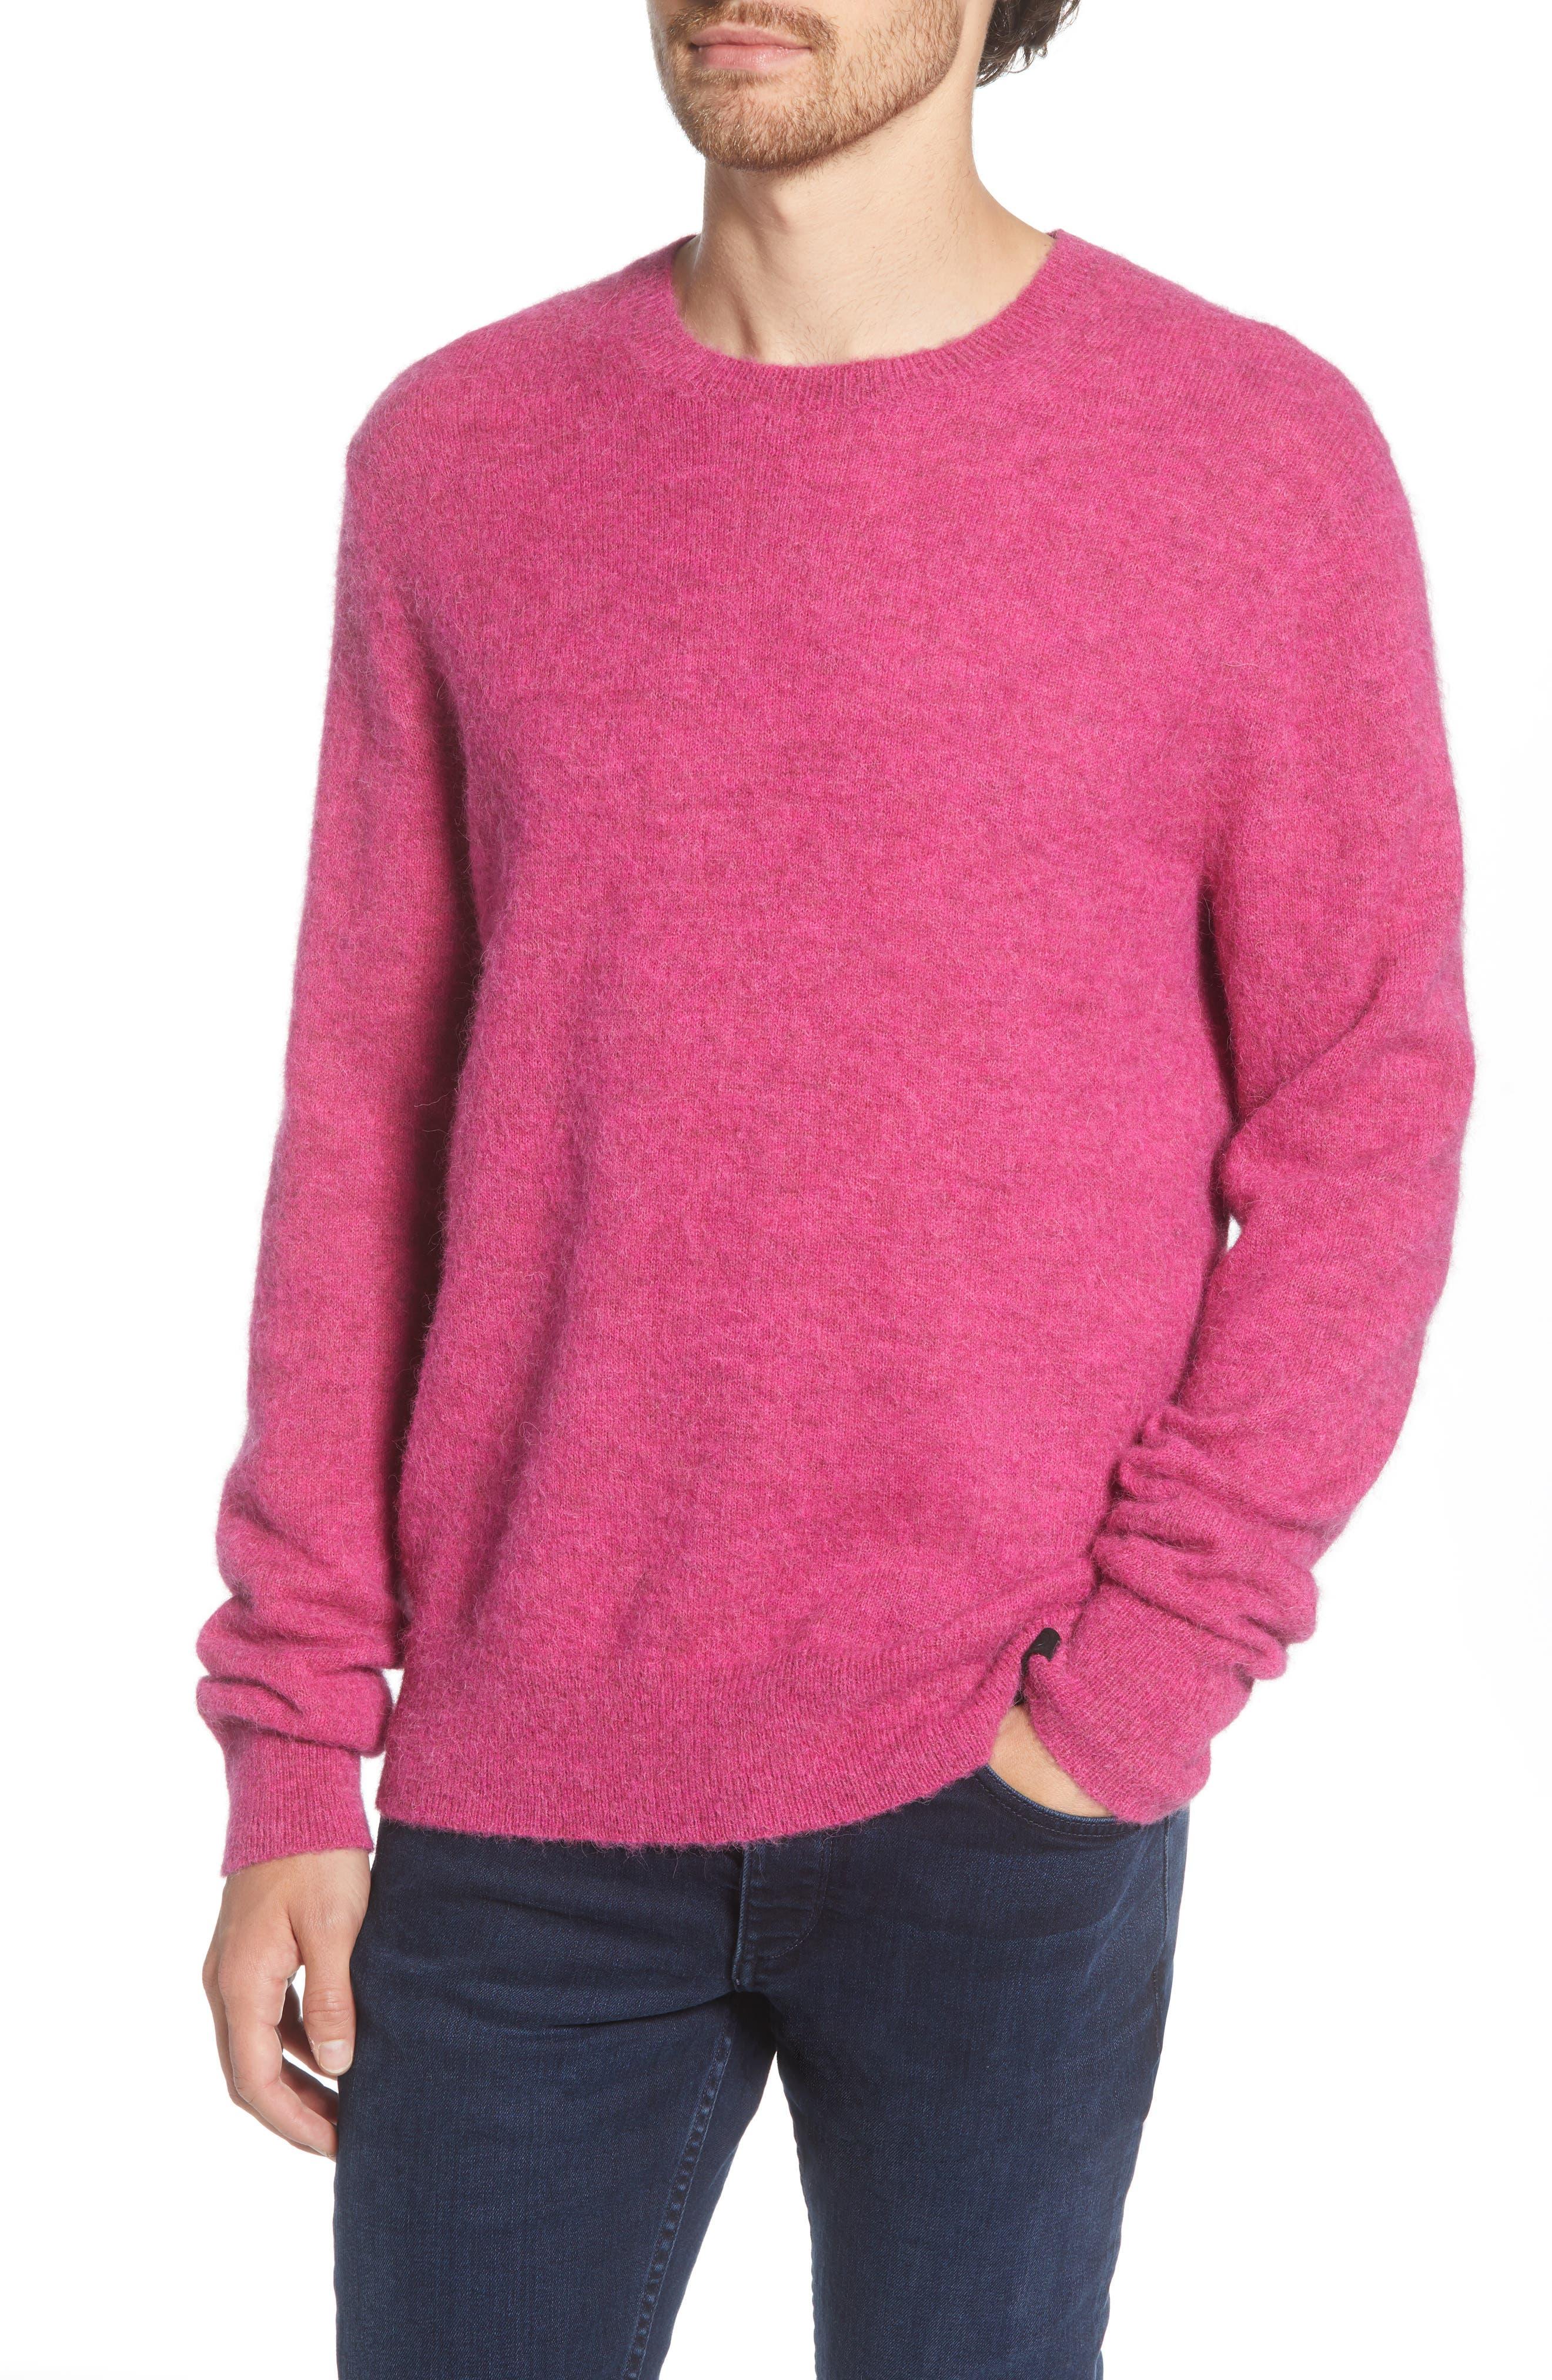 Image of Rag & Bone Arnie Slim Fit Crew Neck Sweater